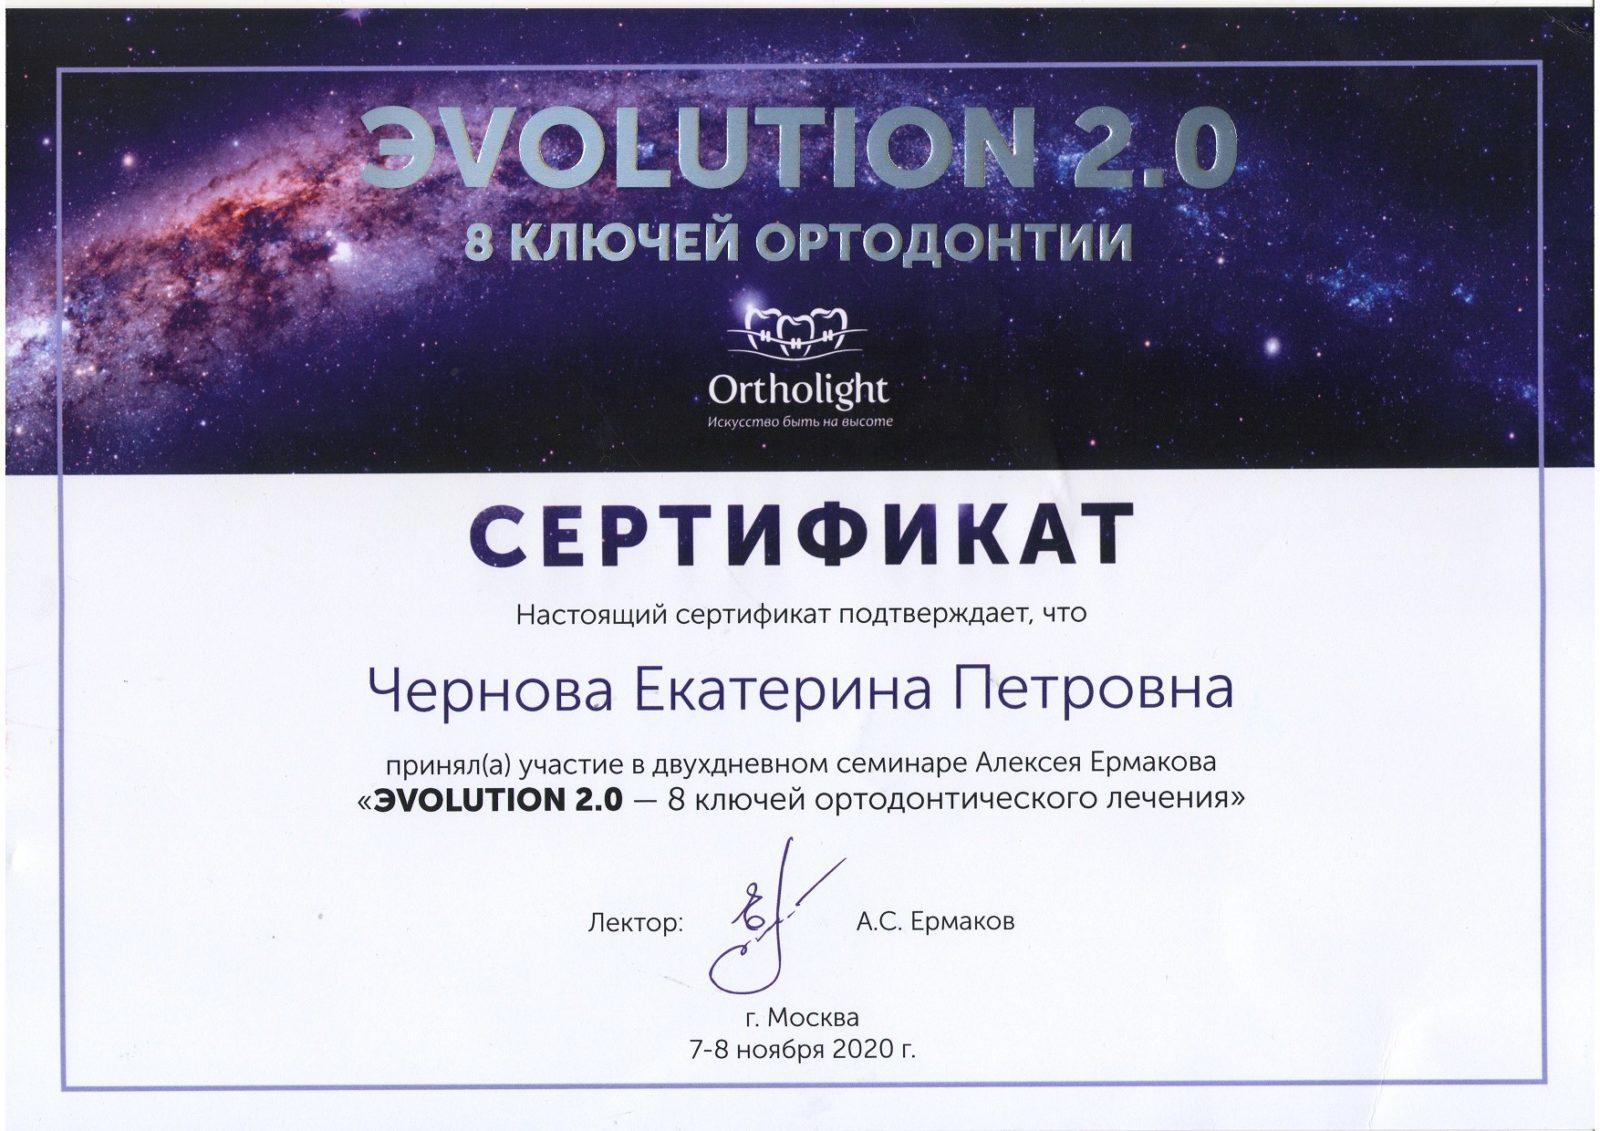 http://oris-vidnoe.ru/wp-content/uploads/2021/06/chernova-3.jpg